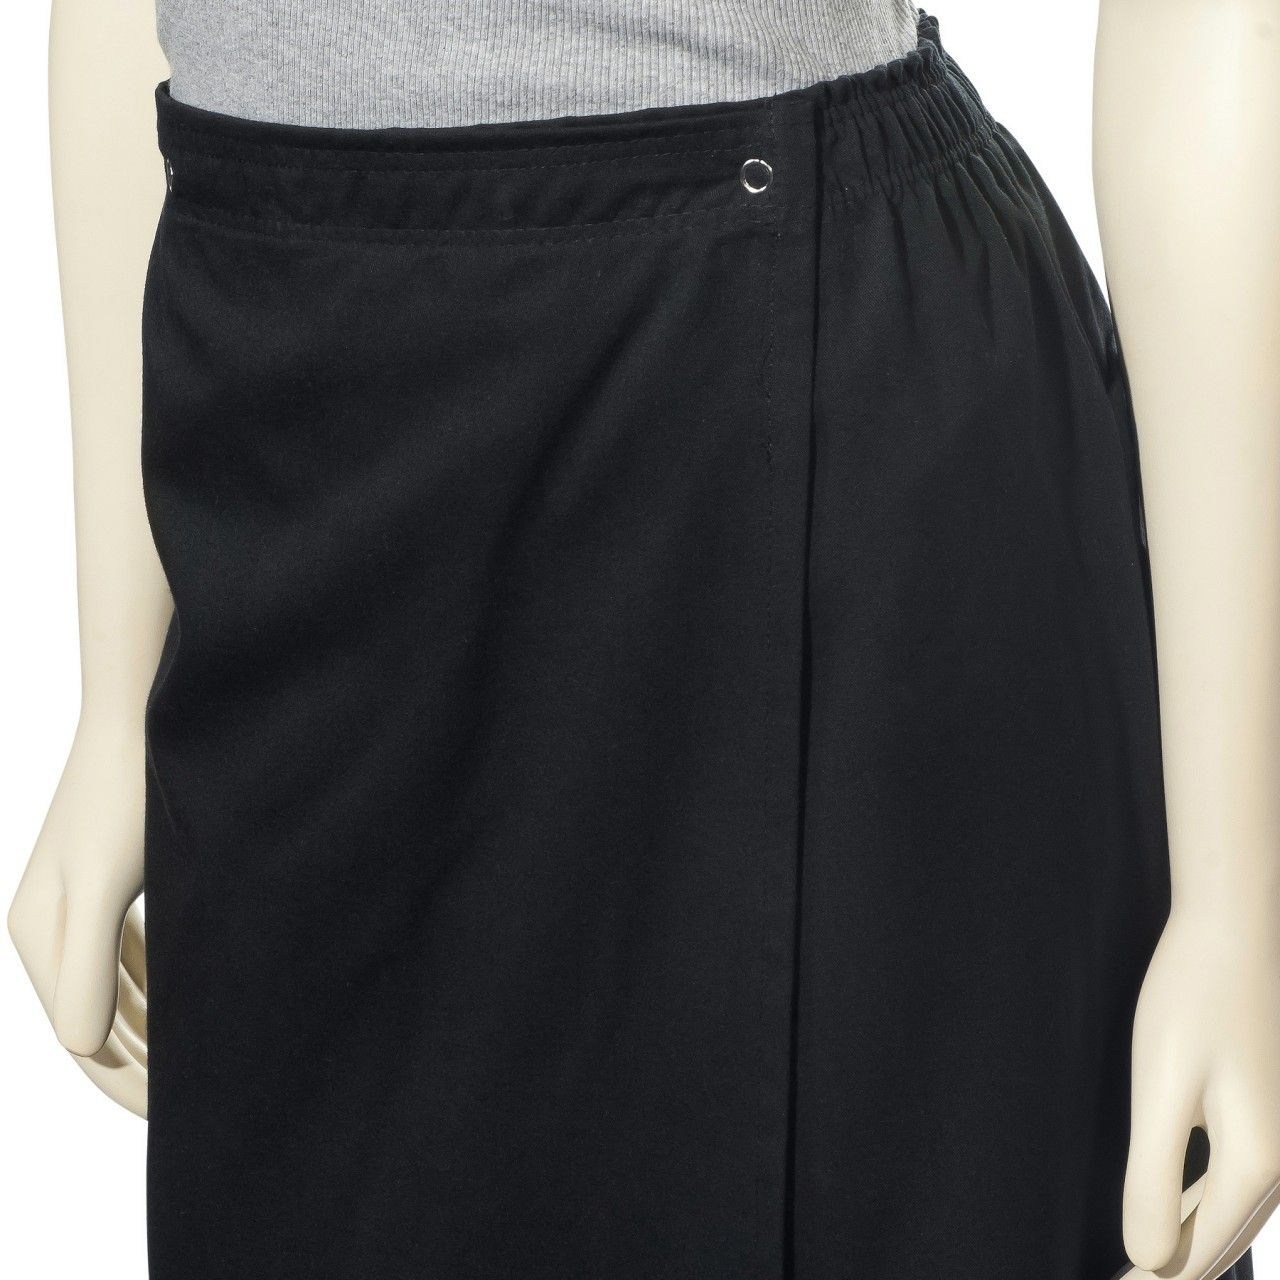 df929bd5543 Adaptive Clothing Showroom - Women s Wrap Around Skirt